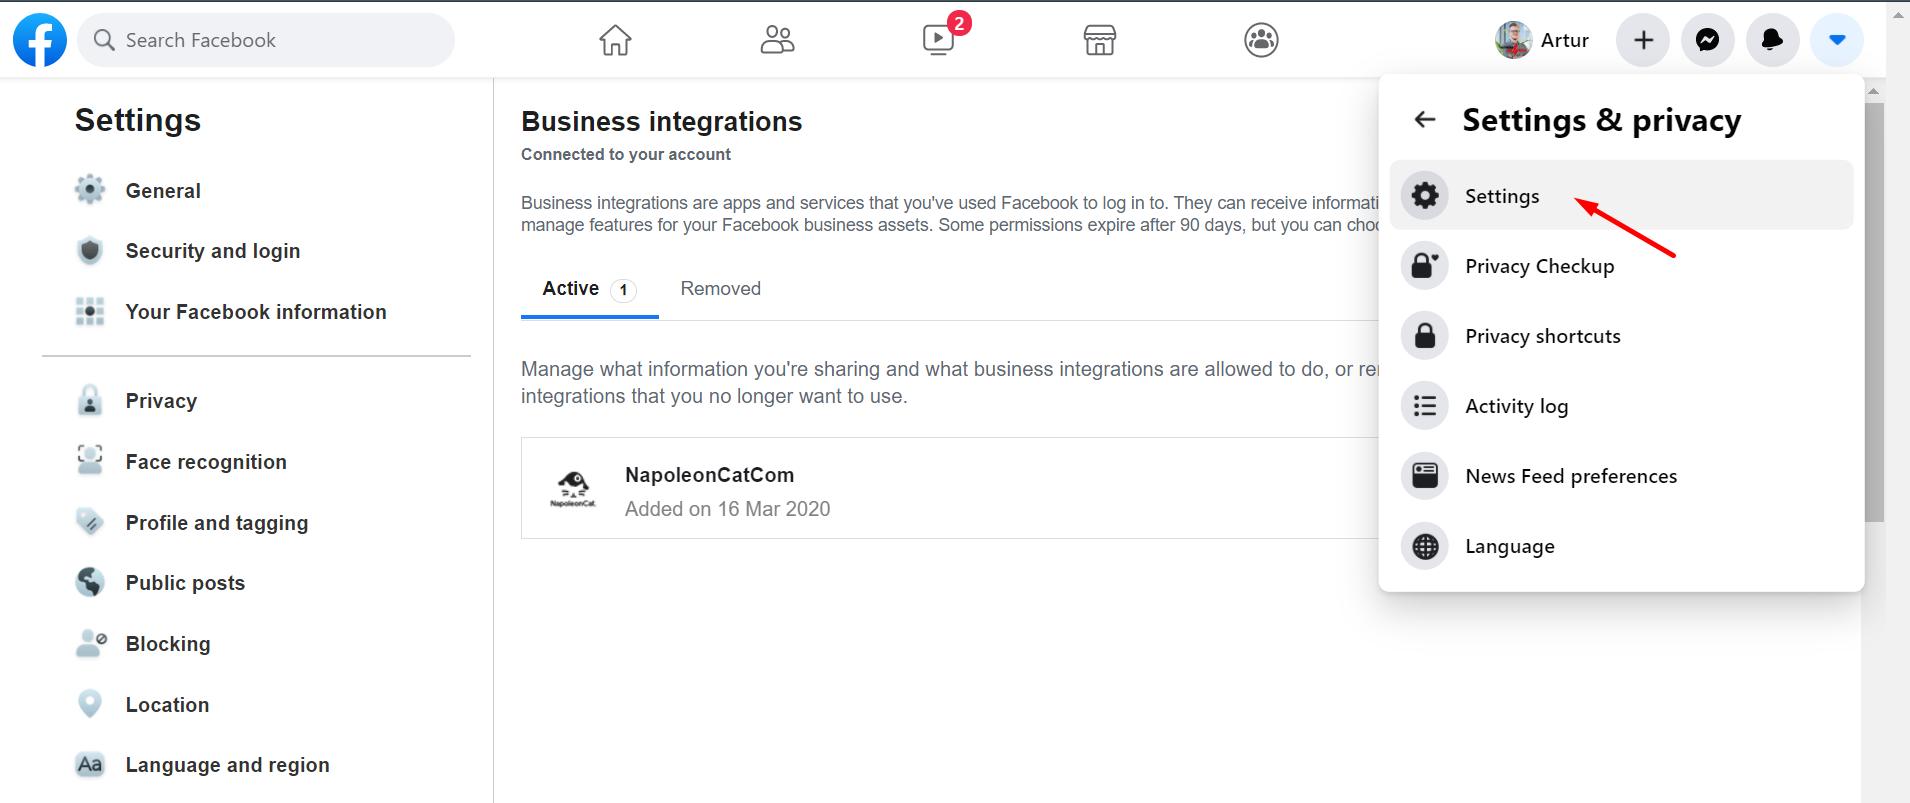 facebook business integrations settings